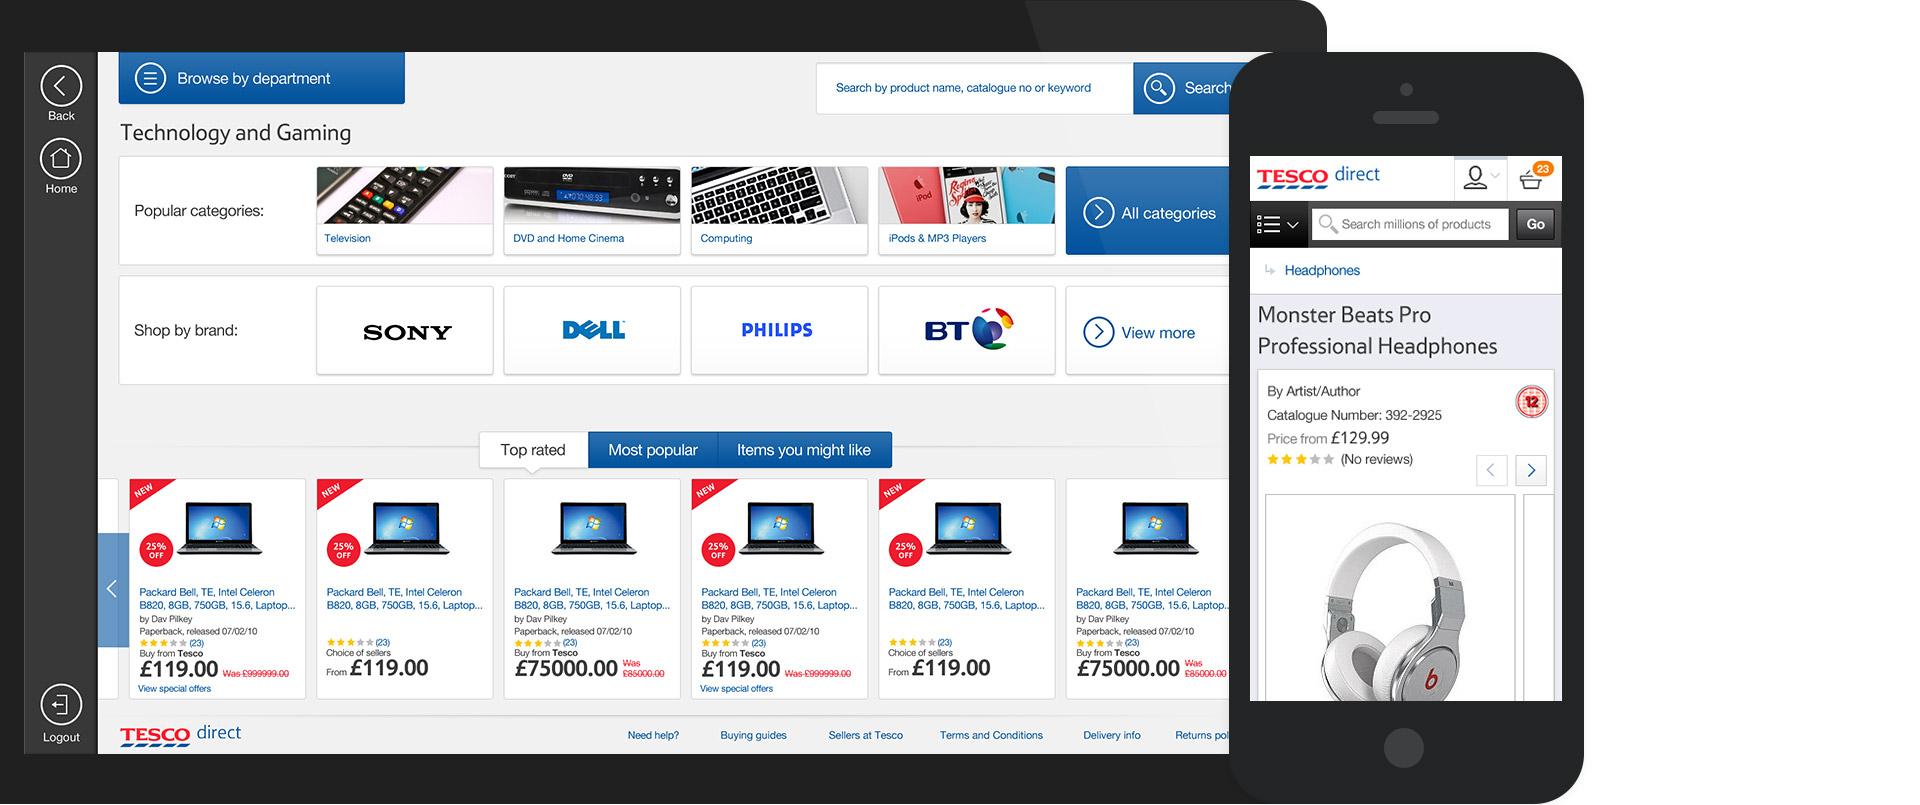 portfolio work tesco direct 03 - Tesco cerrará tienda online Tesco Direct para reforzar su negocio